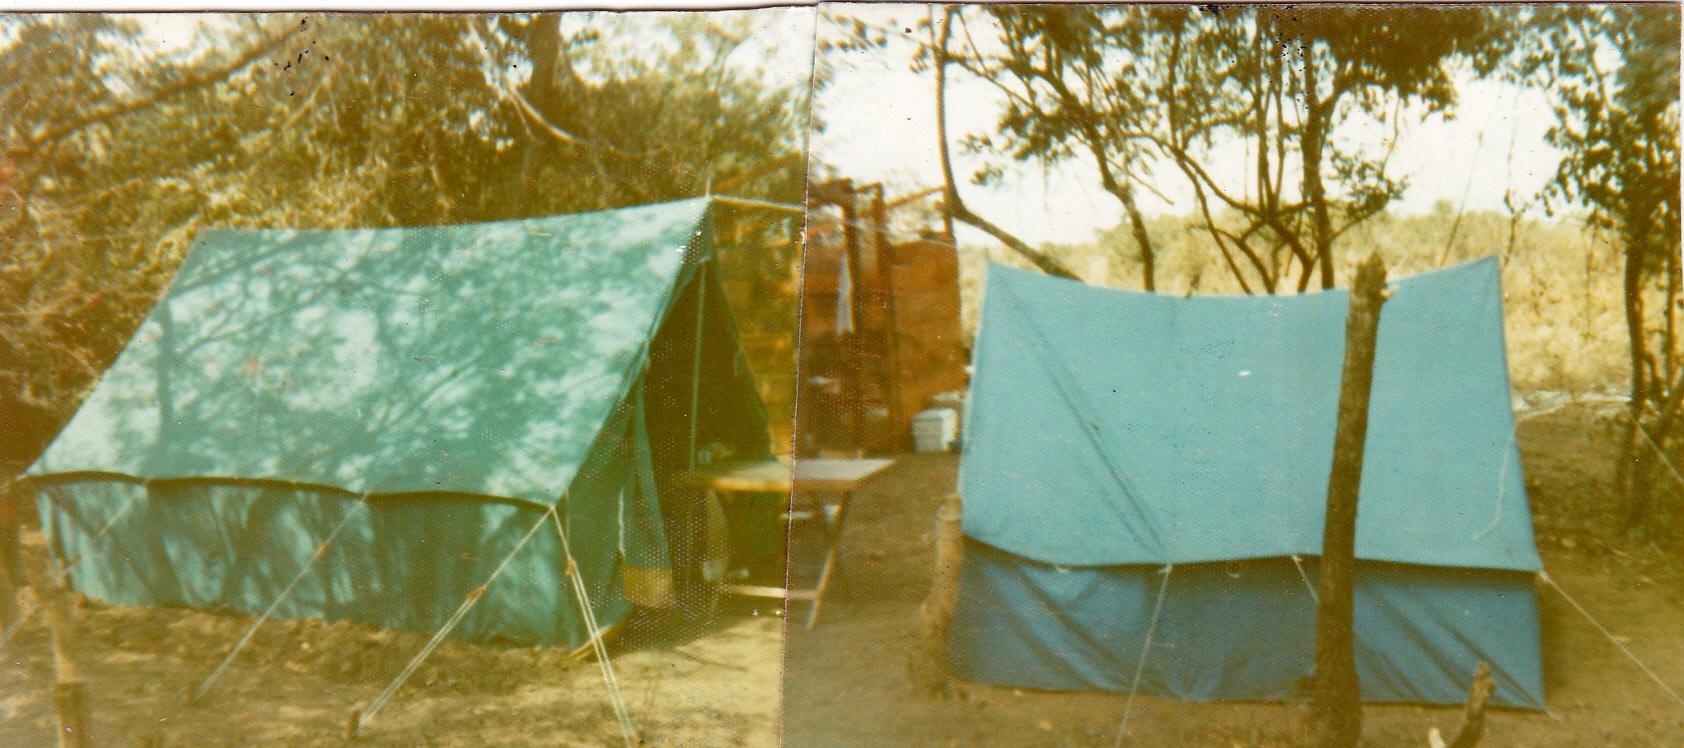 A Tent In Inhaminga Peter J Earle